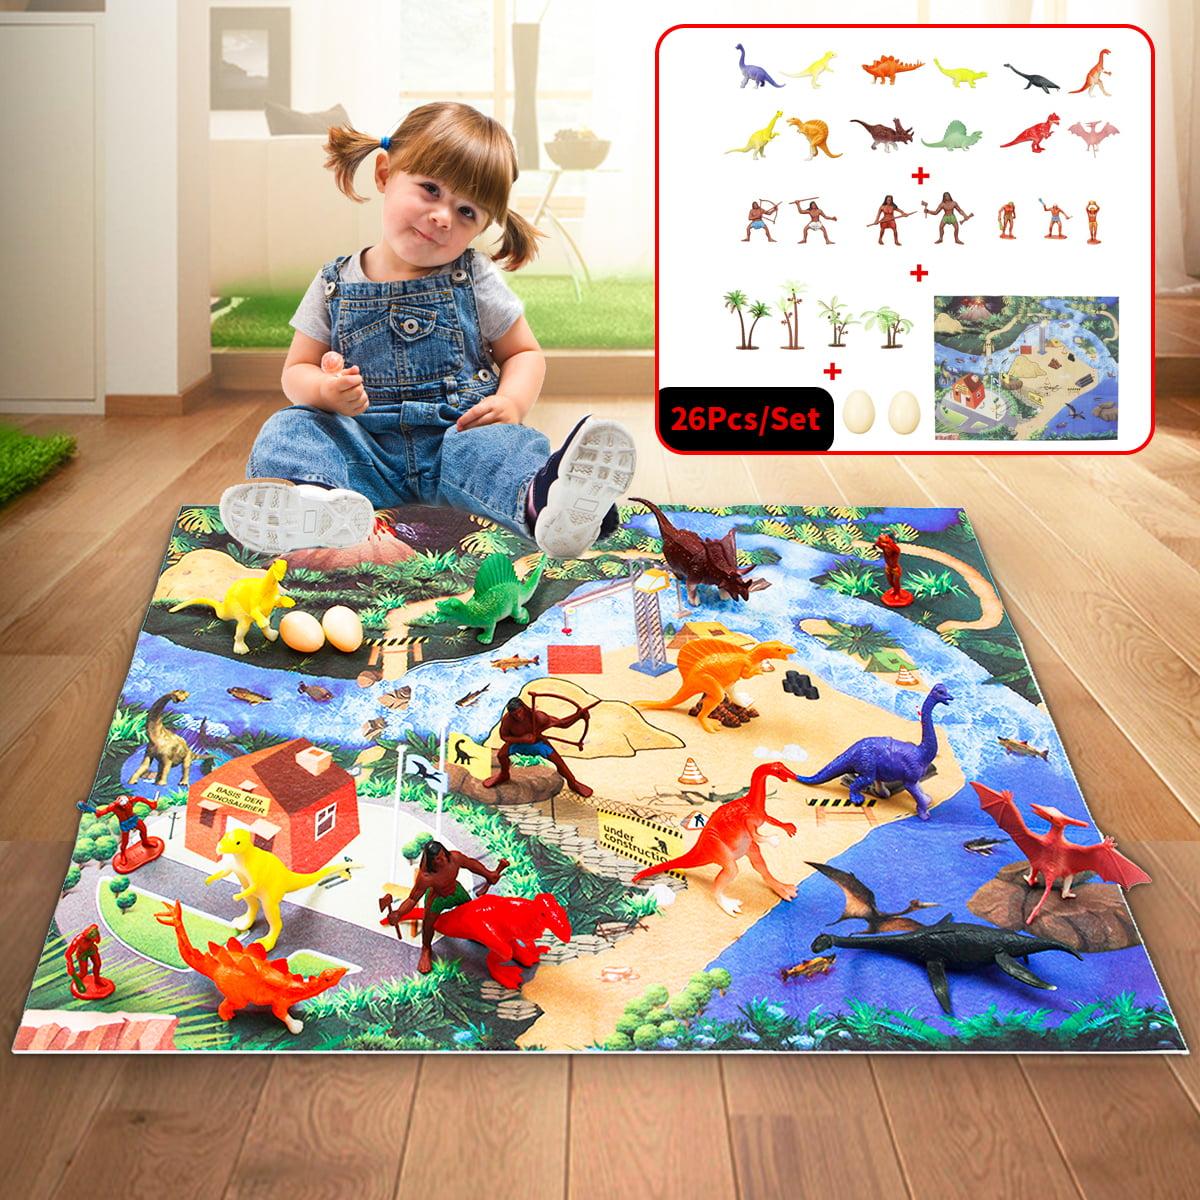 Dinosaur Kids Carpet Playmat Area Floor Rug w/ 26 Toys ...